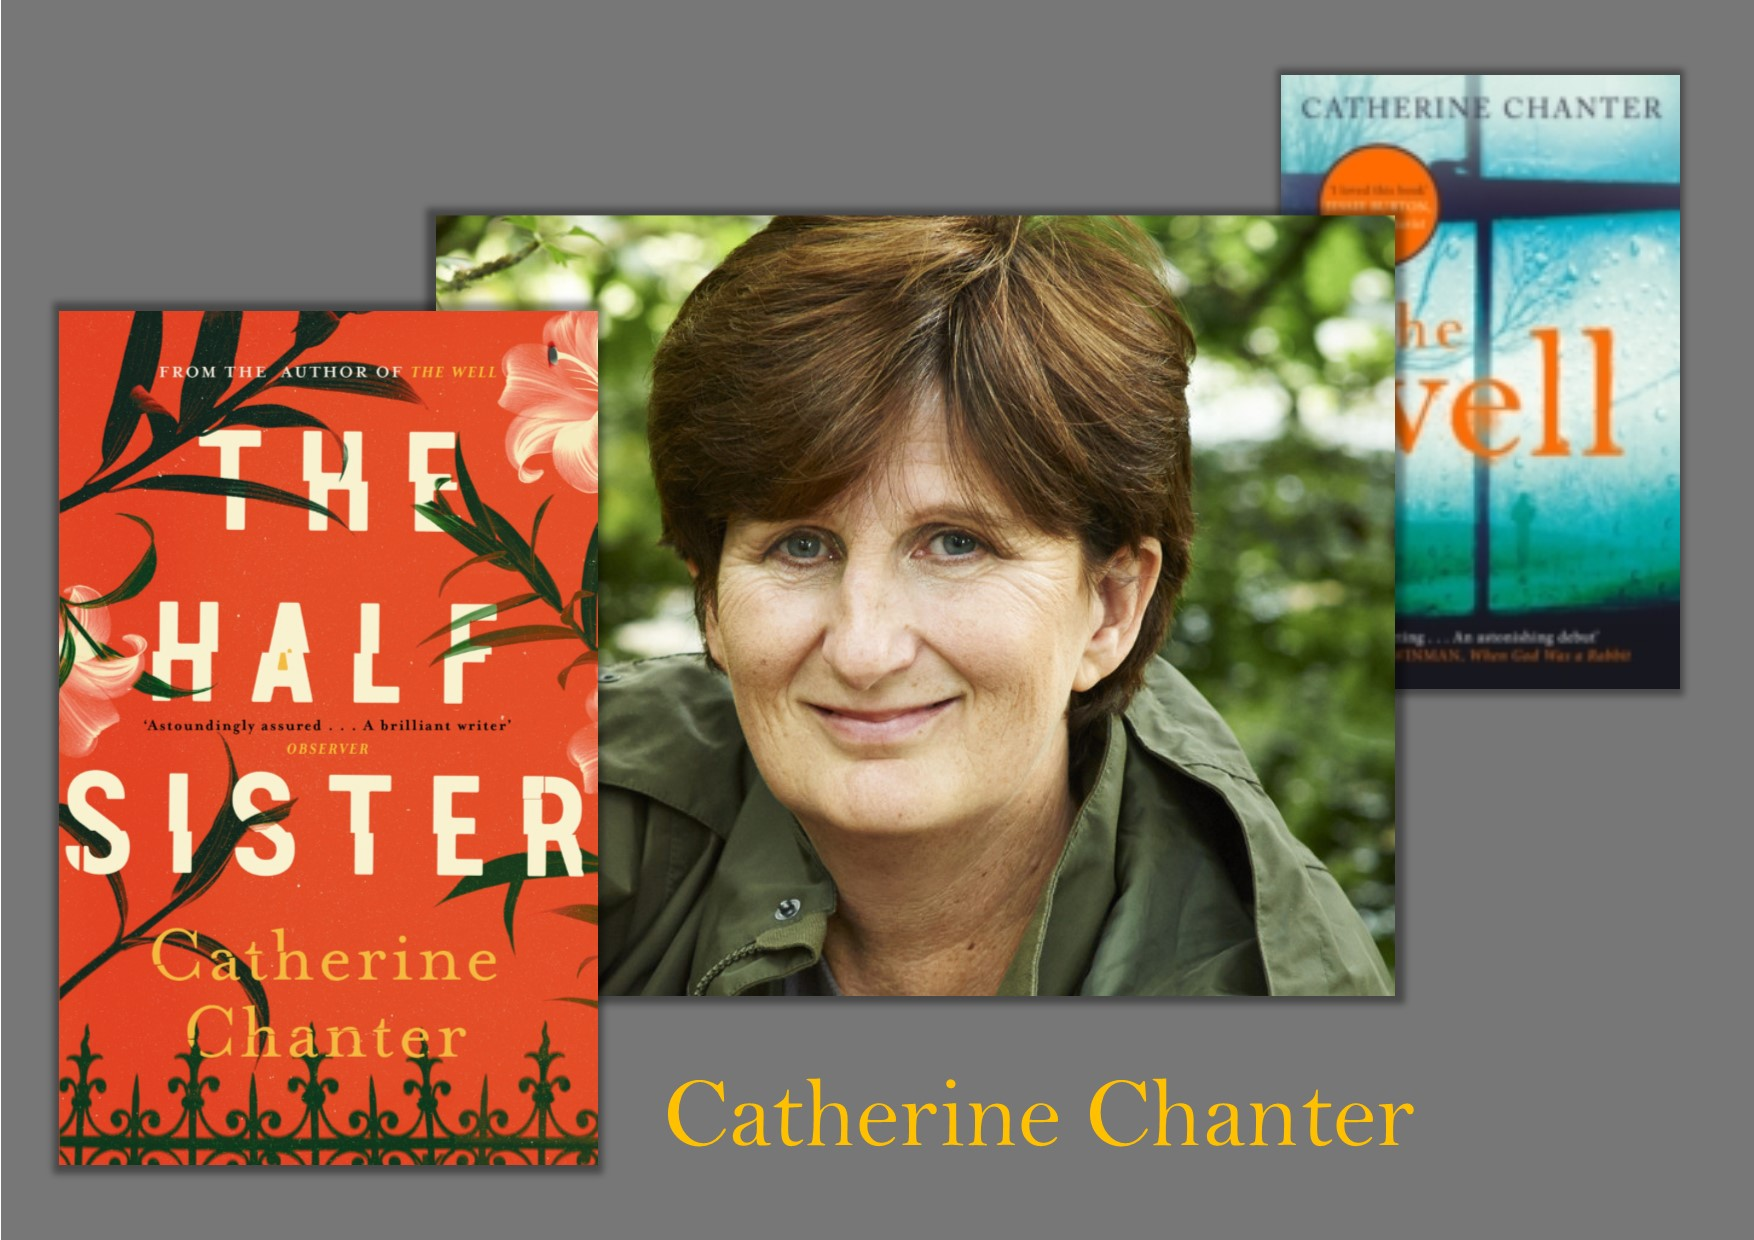 Catherine Chanter